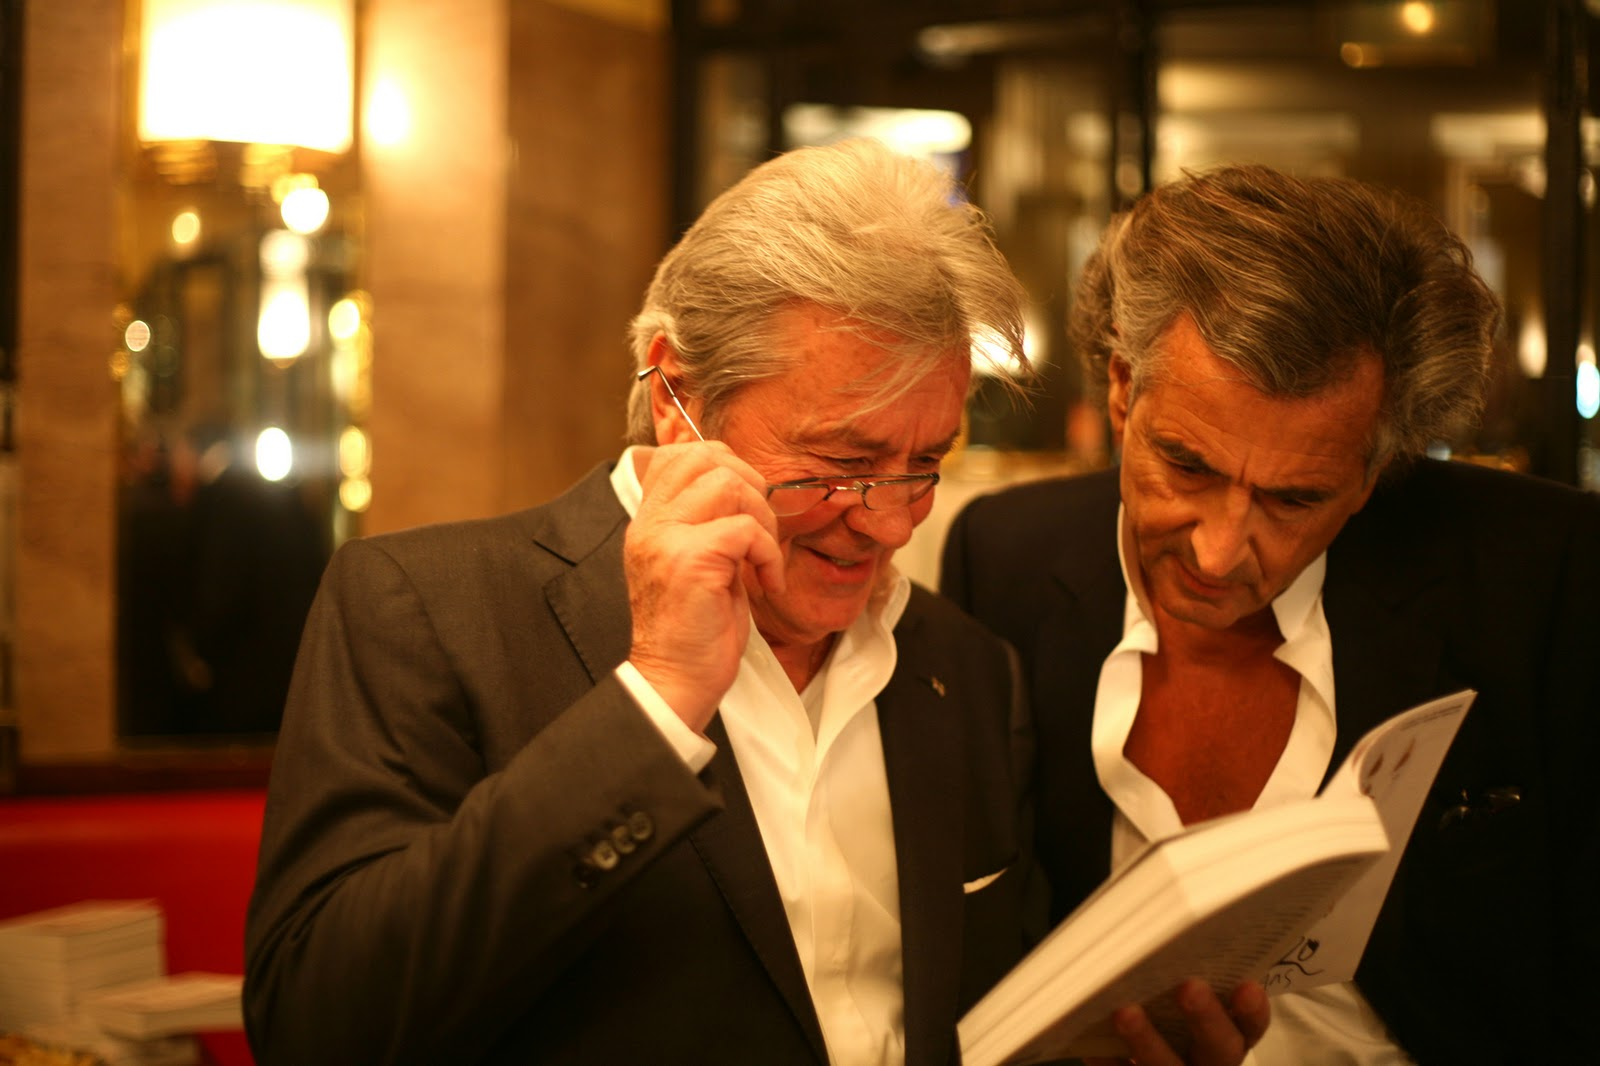 http://3.bp.blogspot.com/_v9CVatzTVh0/TQDndyk0aMI/AAAAAAAAFOI/ba9Bwqf1_P4/s1600/Alain-Delon-et-Bernard-Henri-Le%CC%81vy.jpg